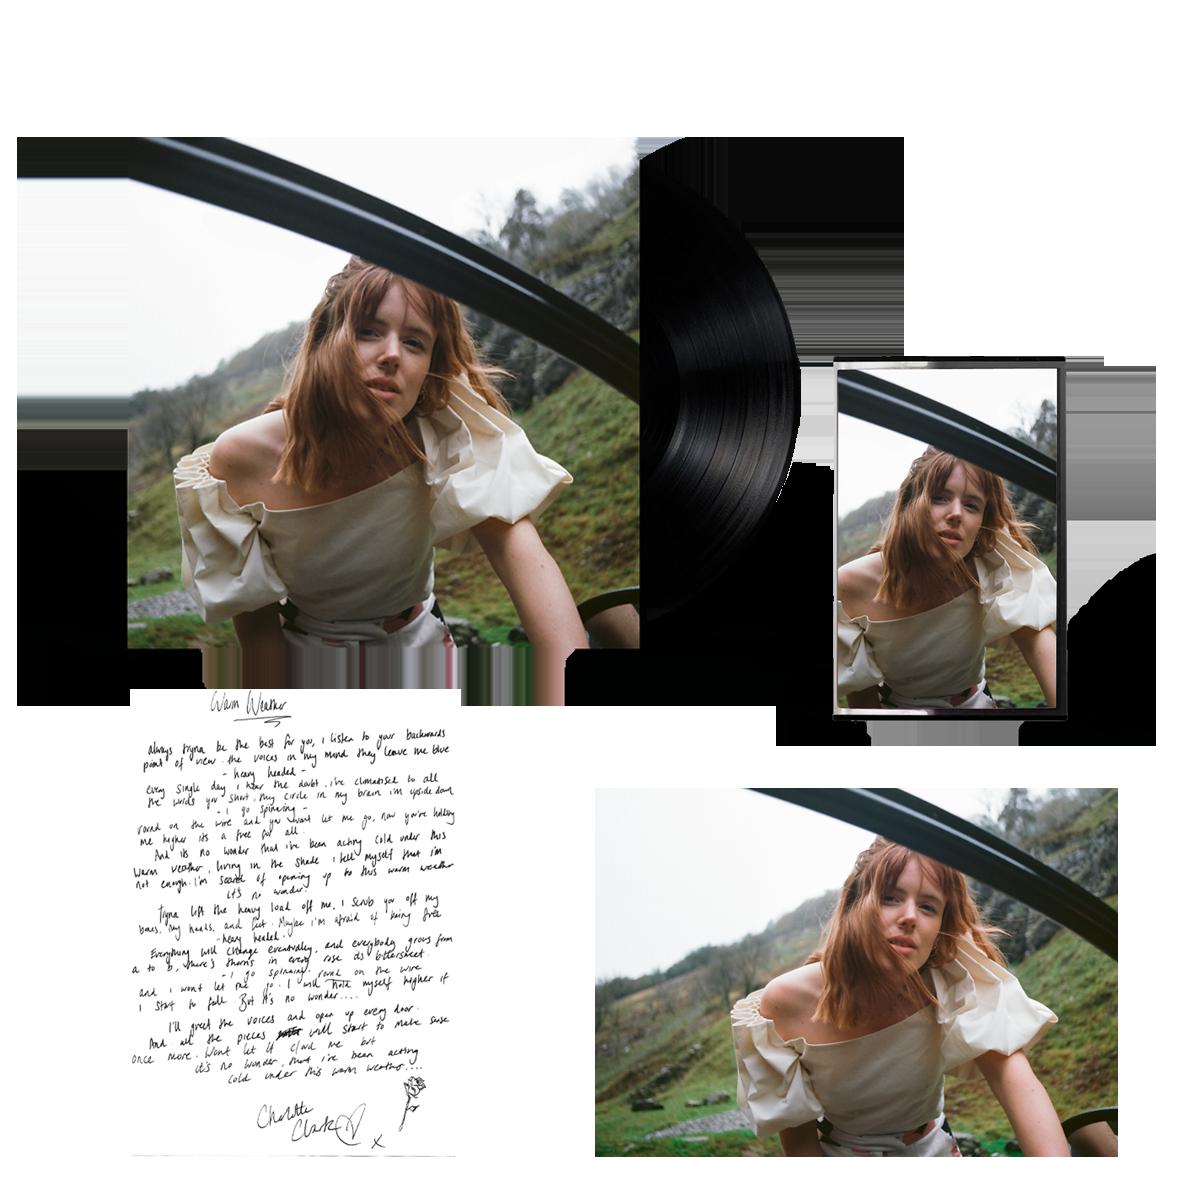 Buy Online Charlotte Clark - Warm Weather Vinyl 12-Inch EP (Signed) + Cassette